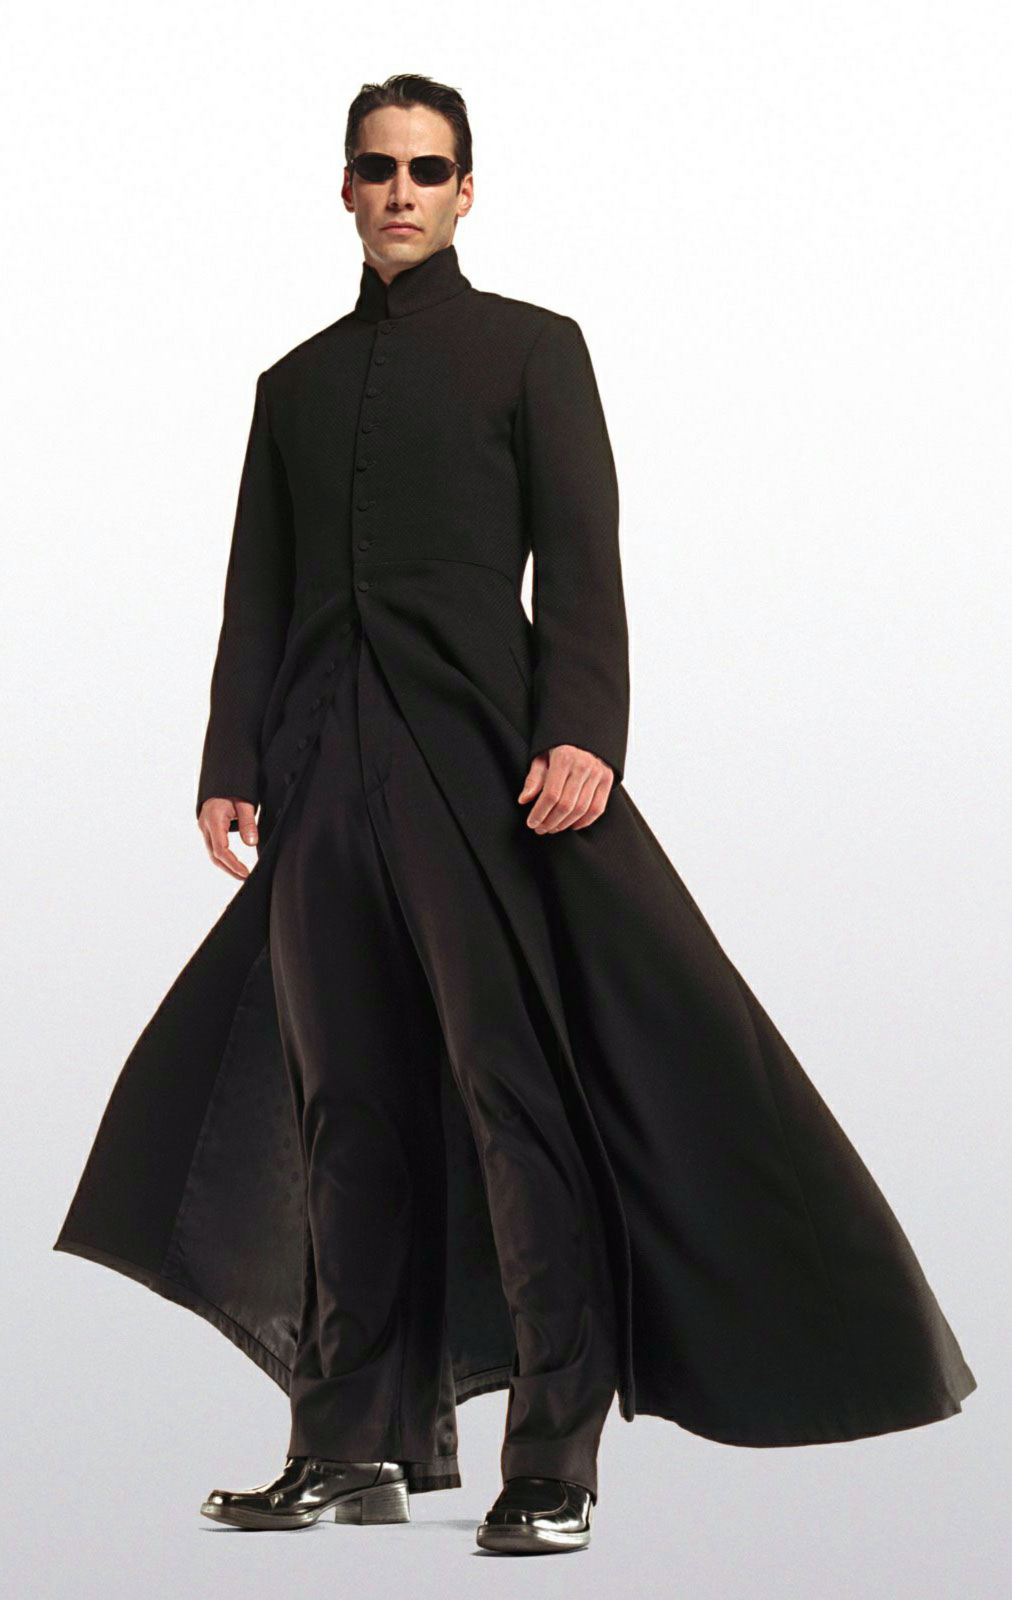 Matrix - Neo (Keanu Reeves)